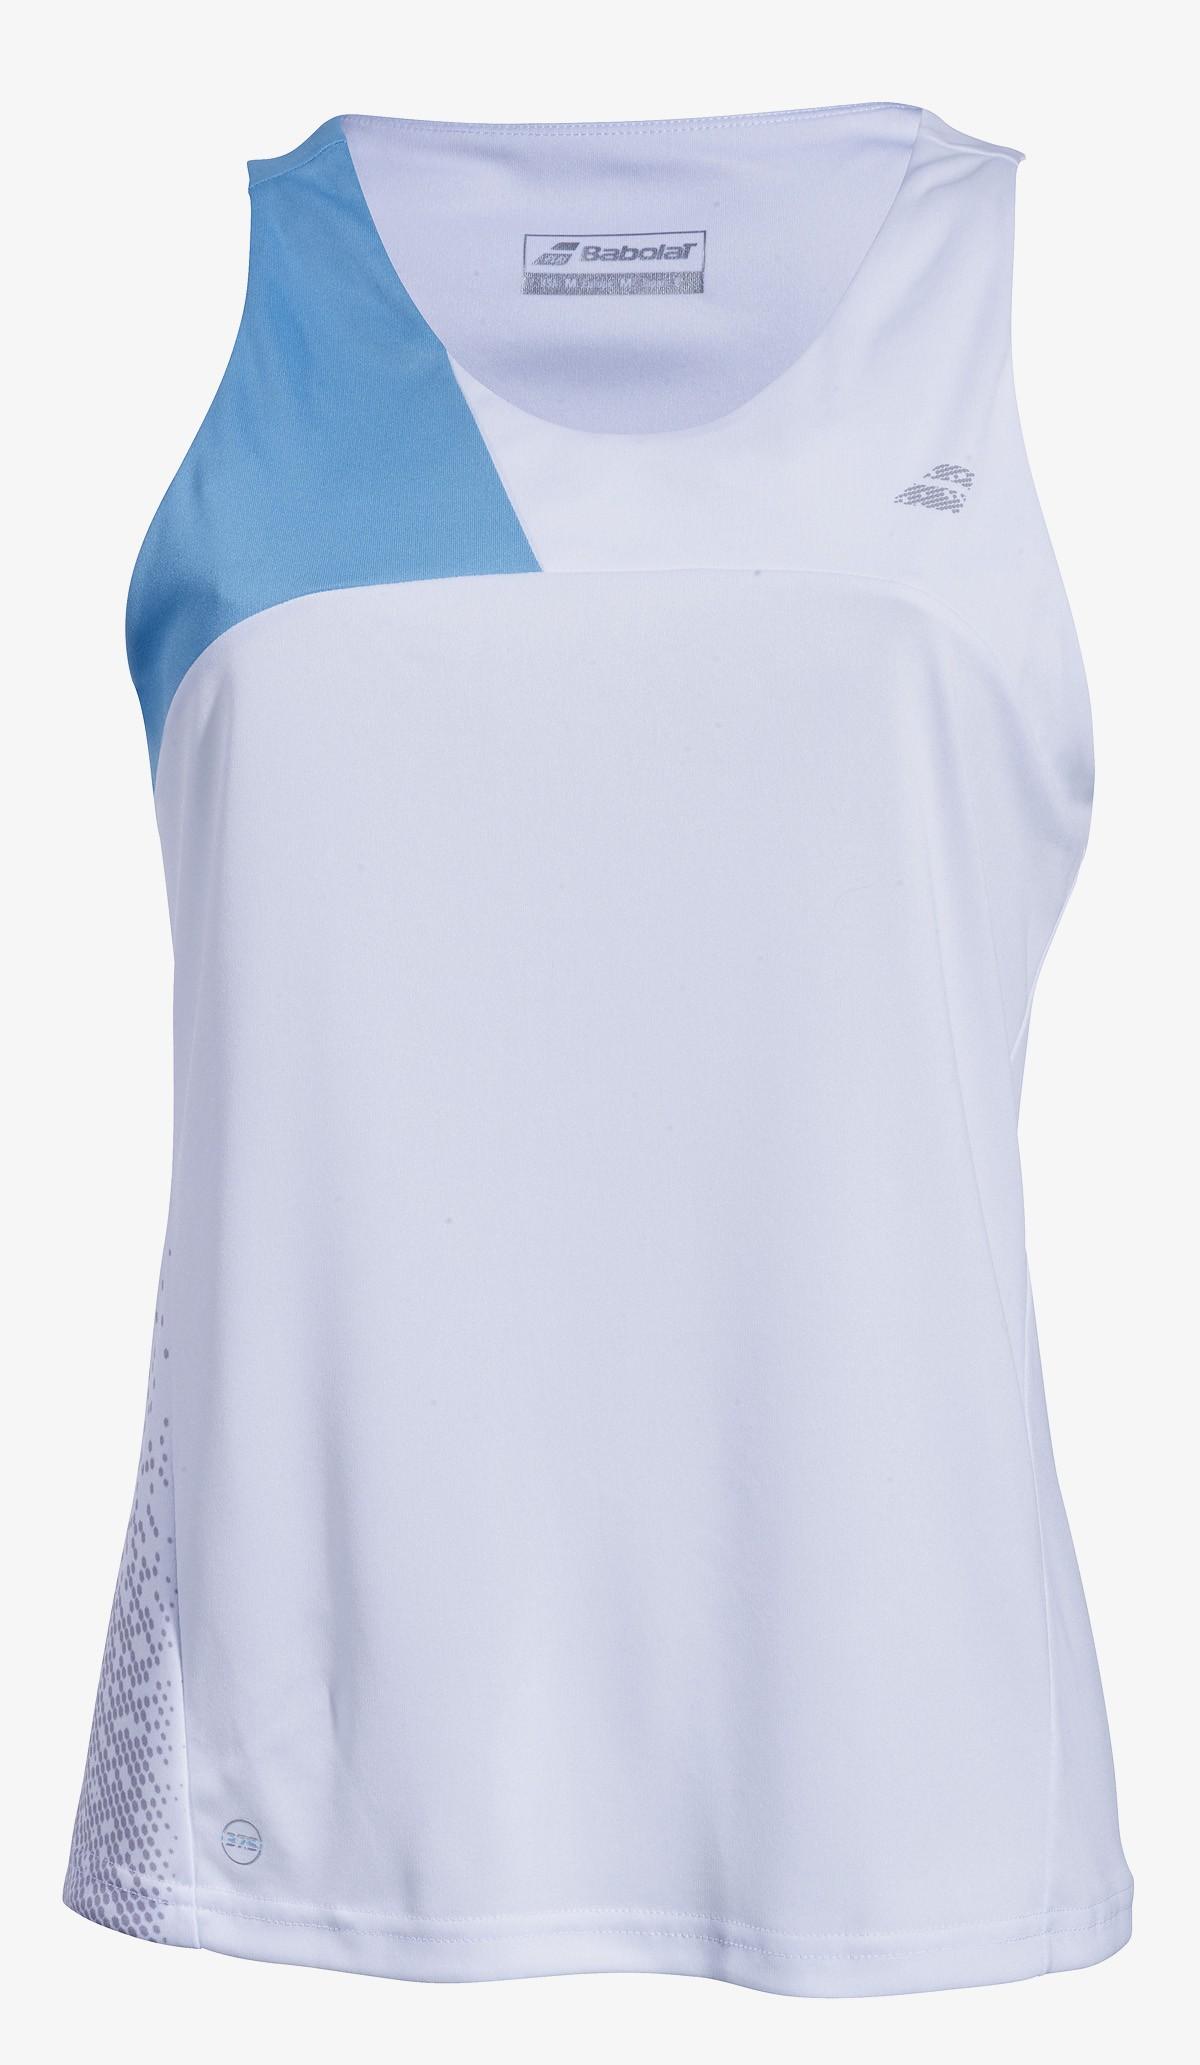 Koszulka tenisowa damska Babolat PERF Tank Top White -50%